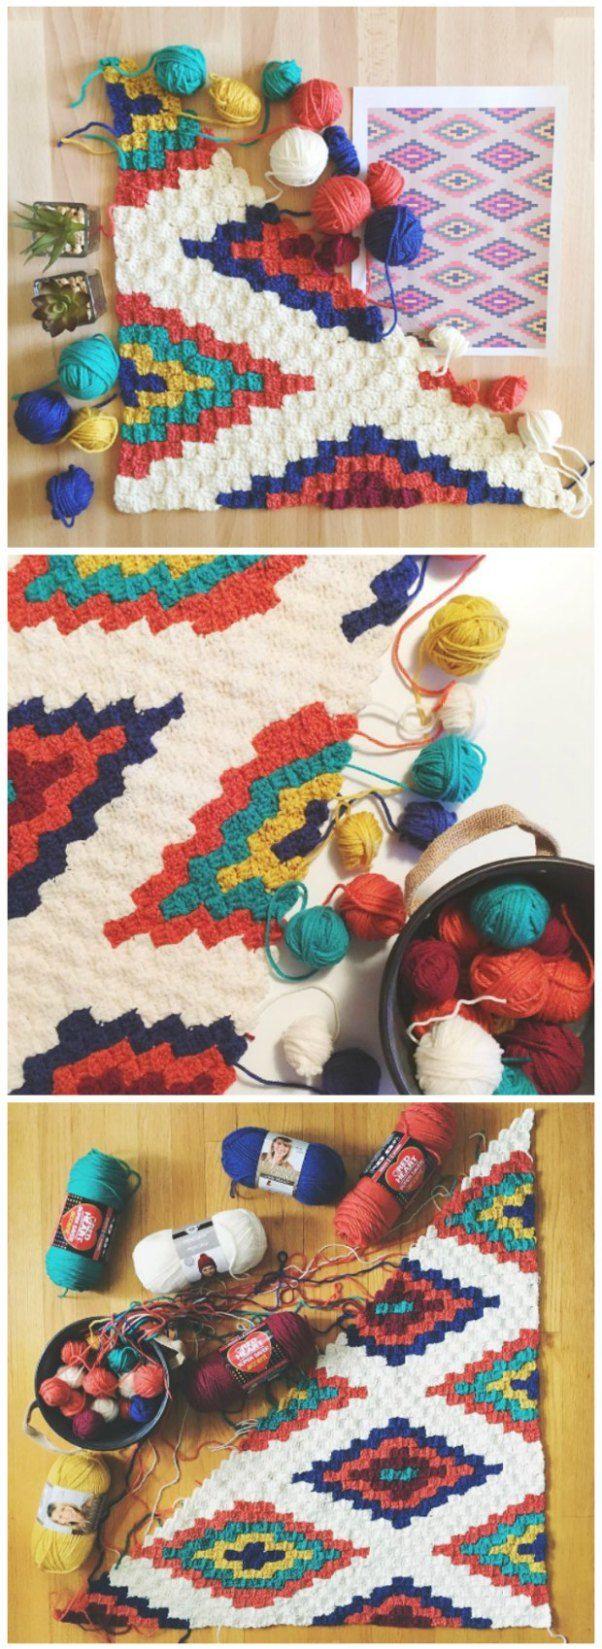 Free crochet pattern. Southwestern style corner to corner crochet throw blanket pattern with graph. C2C